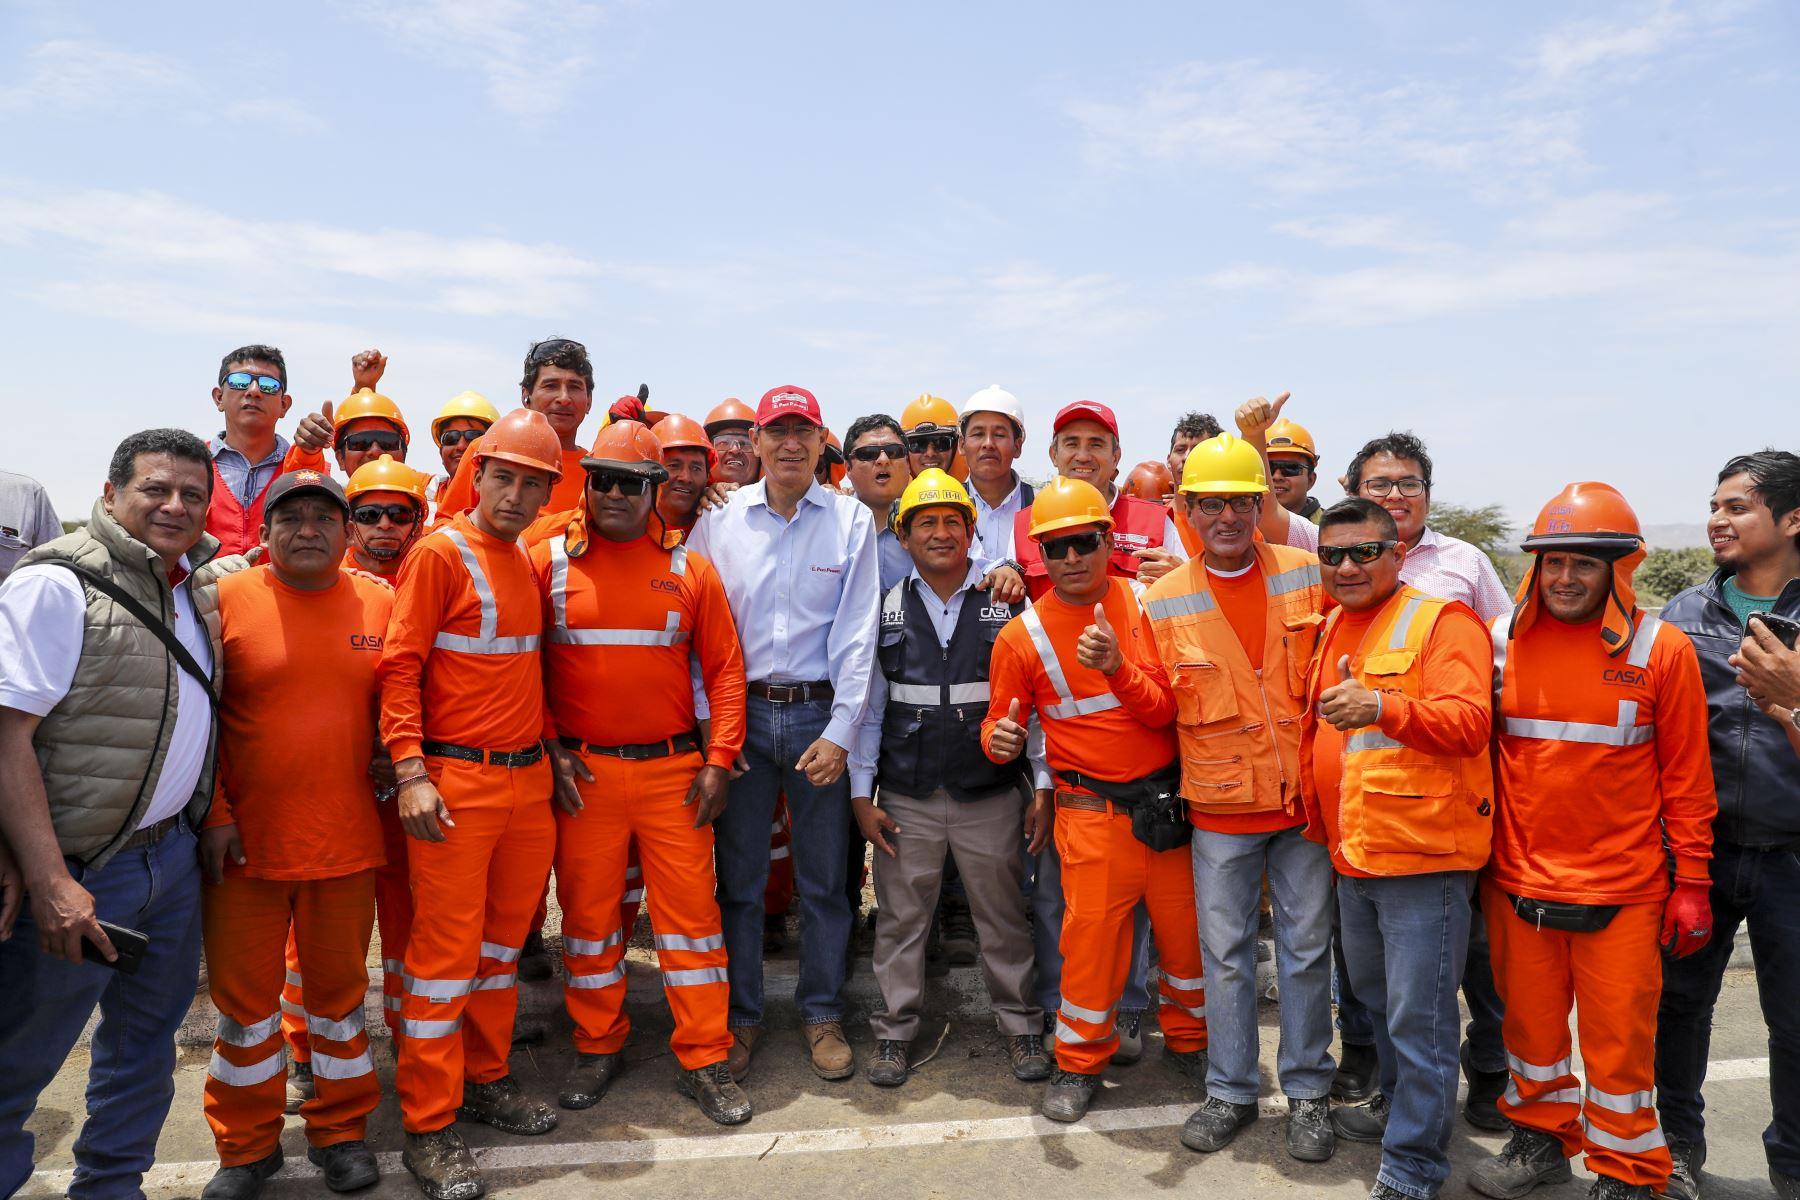 Jefe de Estado, Martín Vizcarra, supervisa obras de rehabilitación de los tramos Dv. Bayóvar – Sechura, Dv Sechura – Terminal Bayóvar en Piura. Foto: ANDINA/Prensa Presidencia